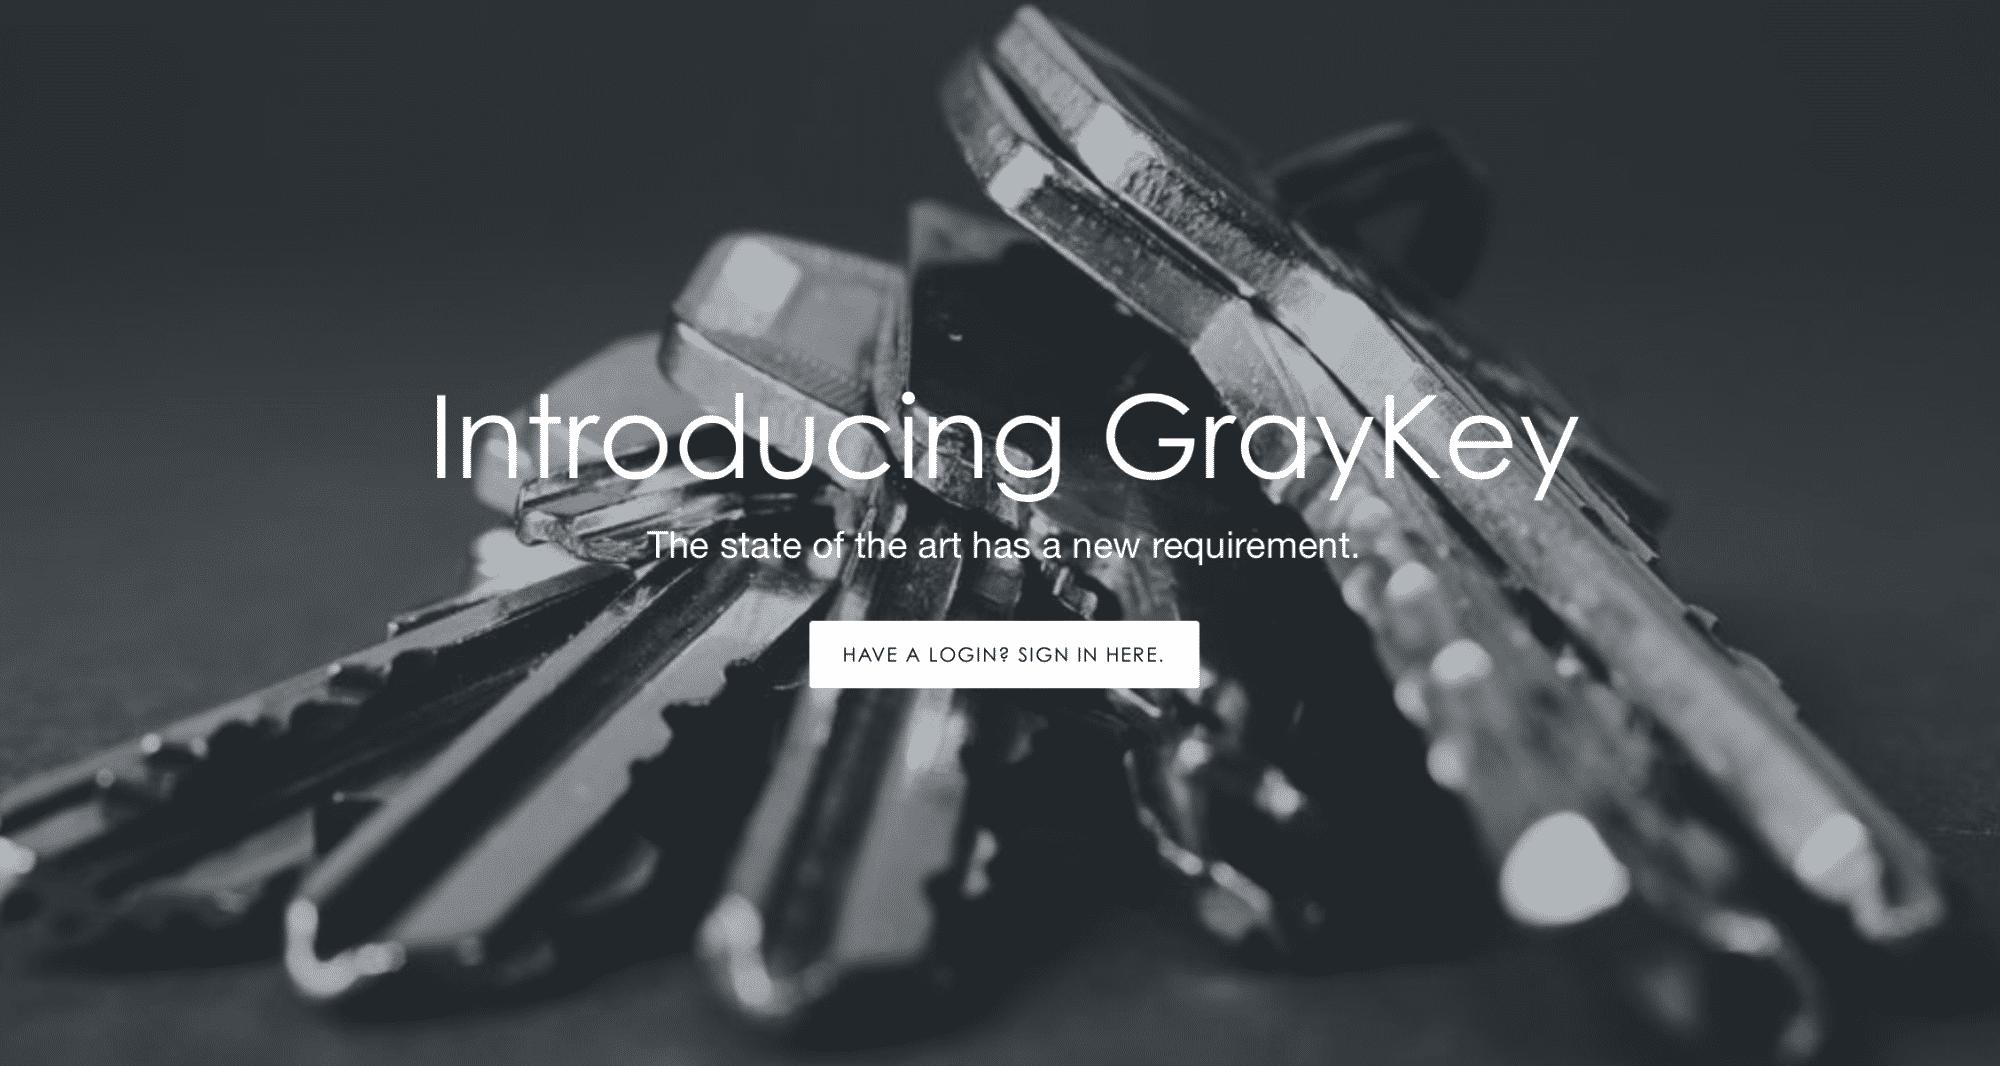 GrayKey